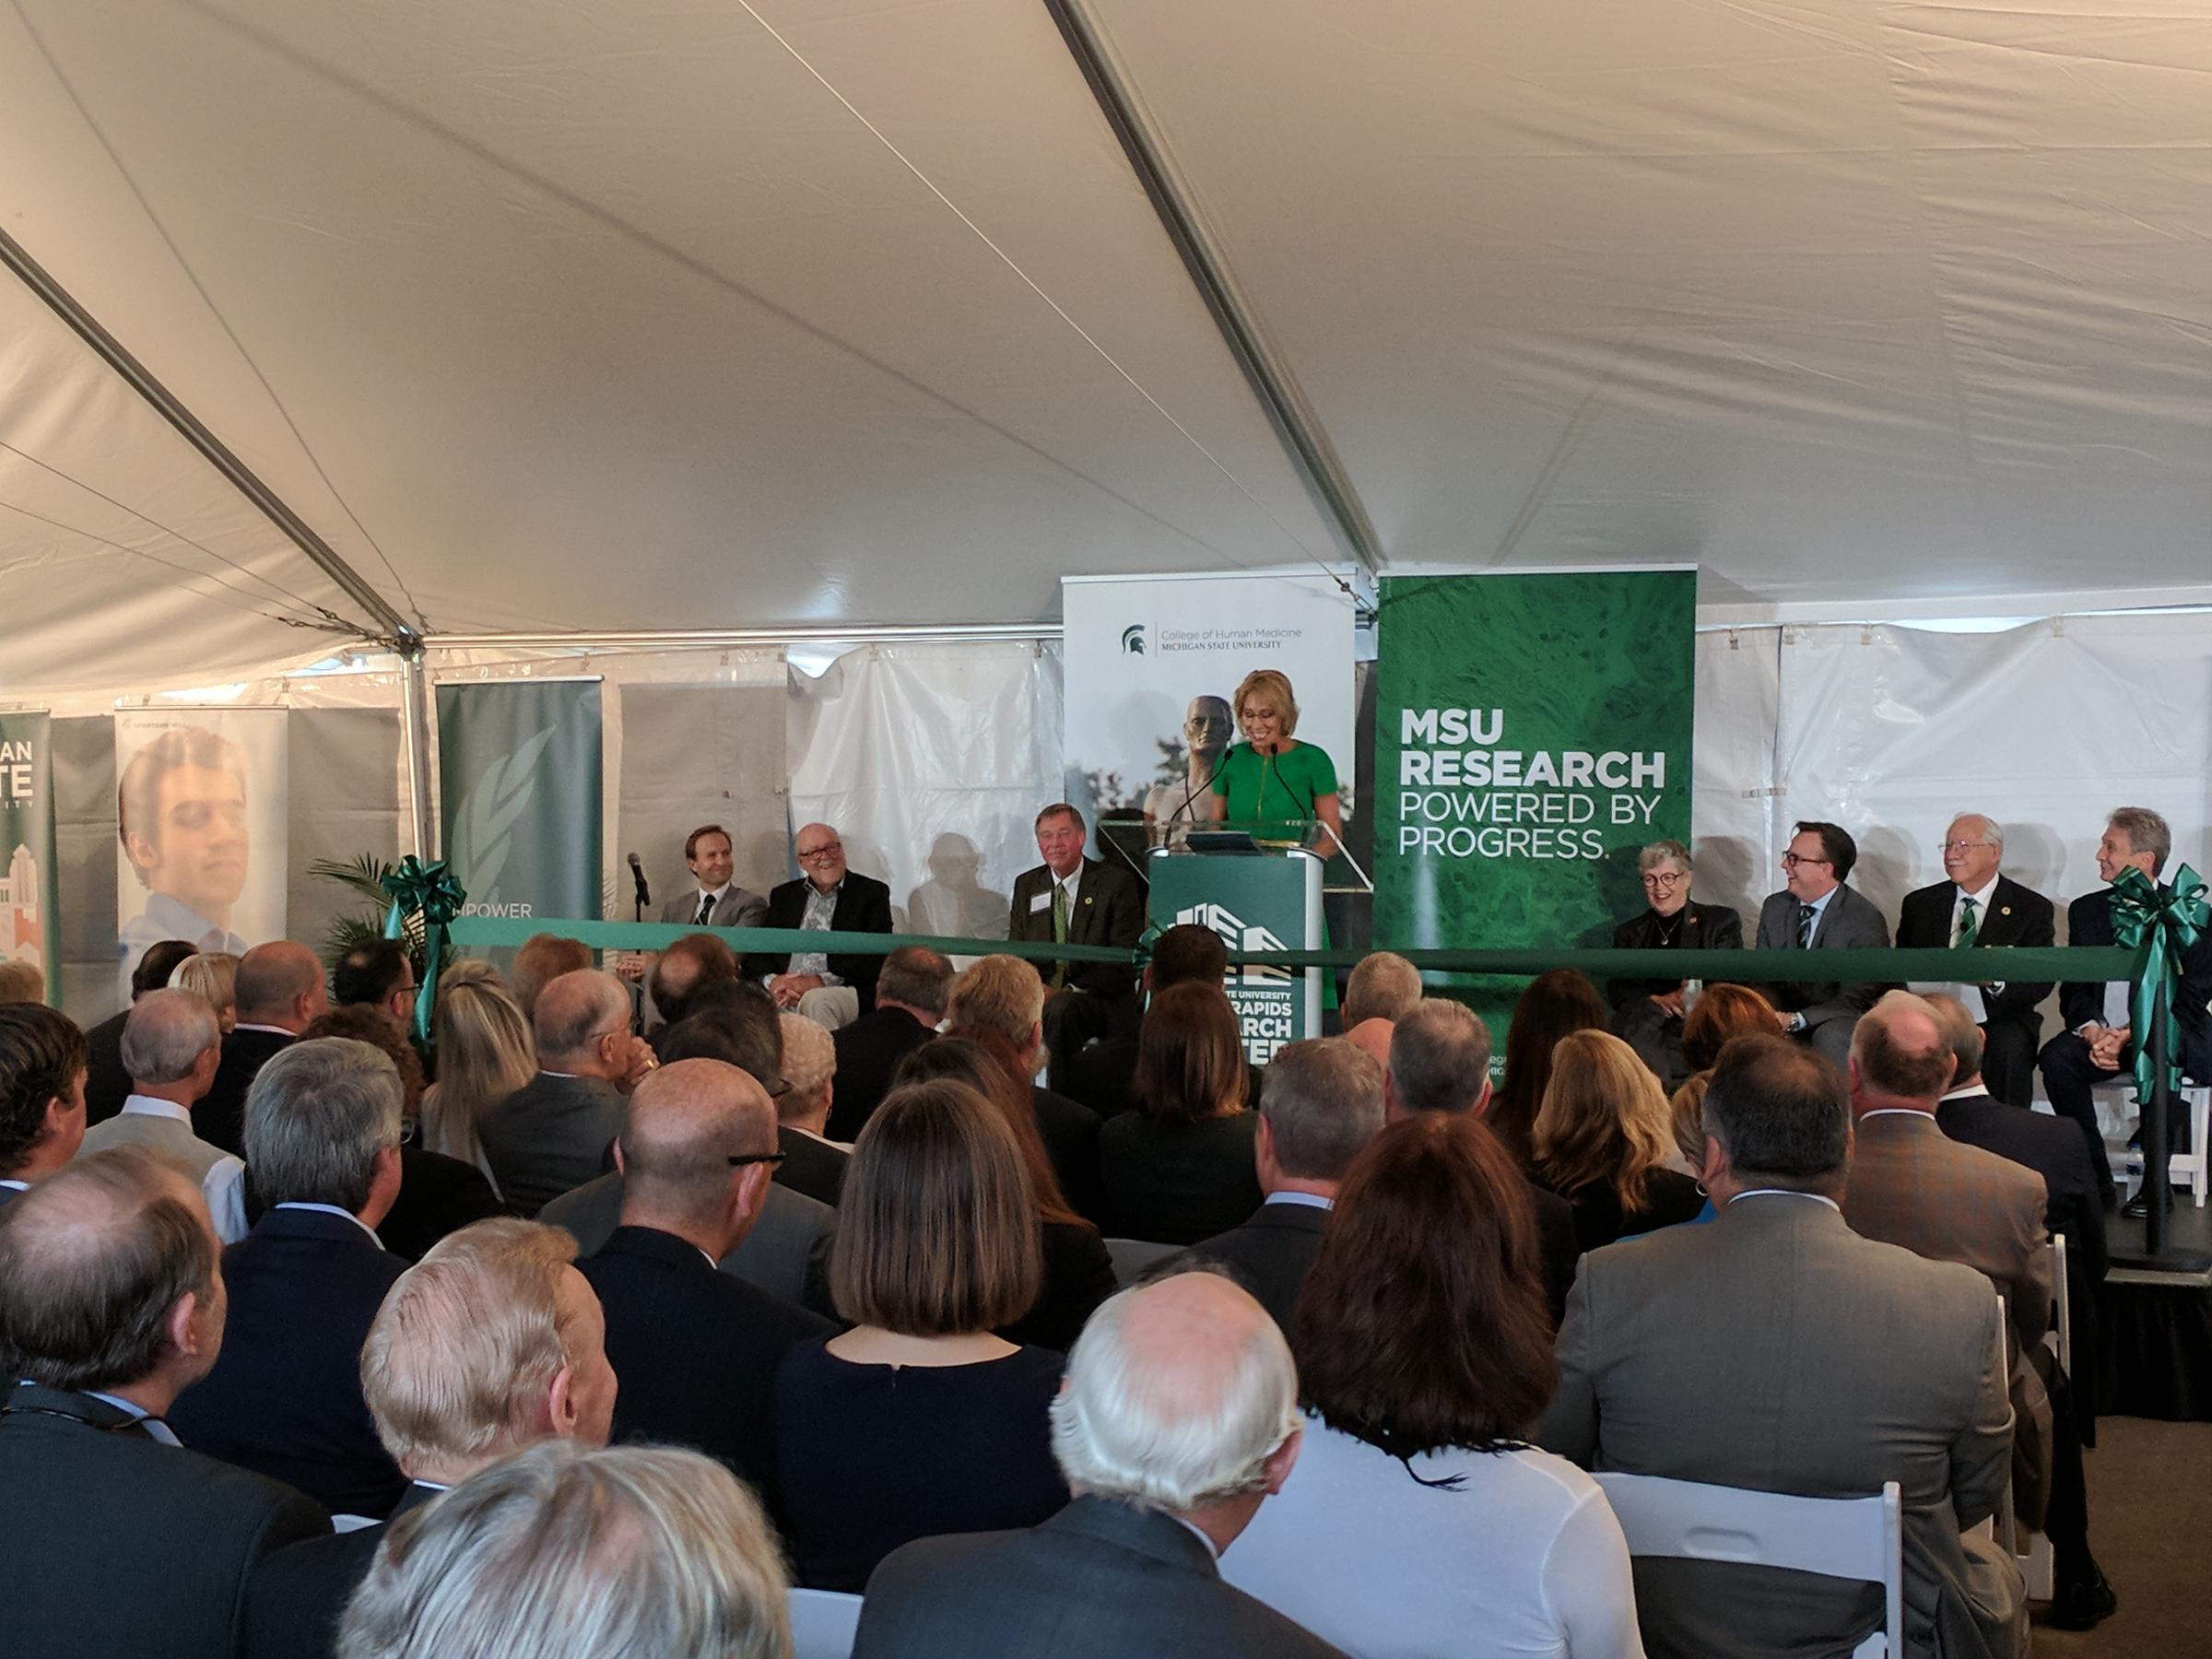 MSU dedicates Grand Rapids Research Center